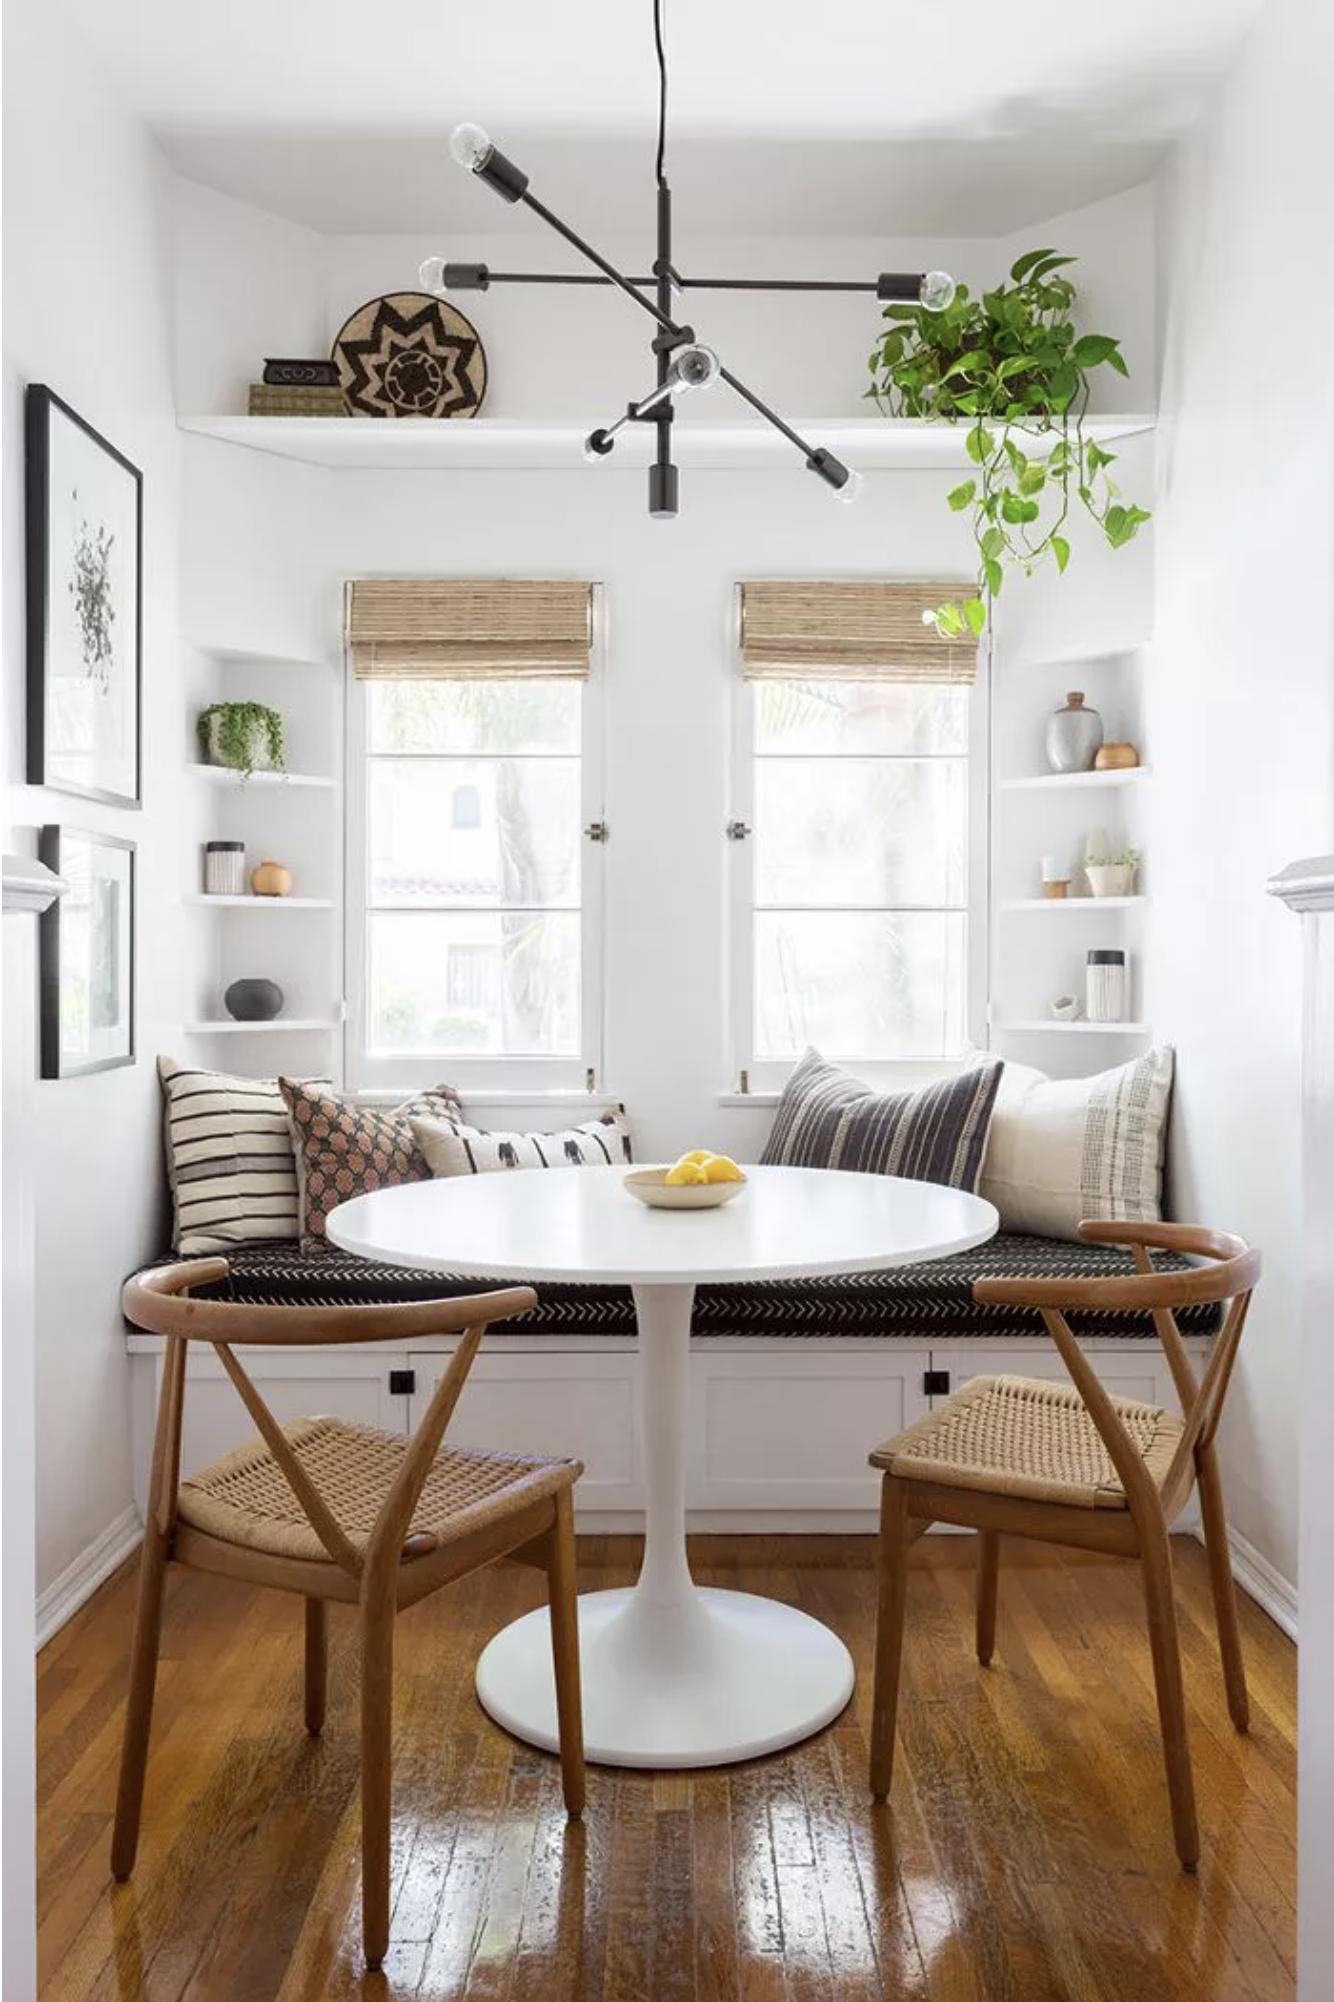 Best Warm White Paint Colors - Benjamin Moore - IMAGE: by Amy Bartlam, Design: Katie Hodges via MyDomaine feat. paint color 'Simply White' from Benjamin Moore